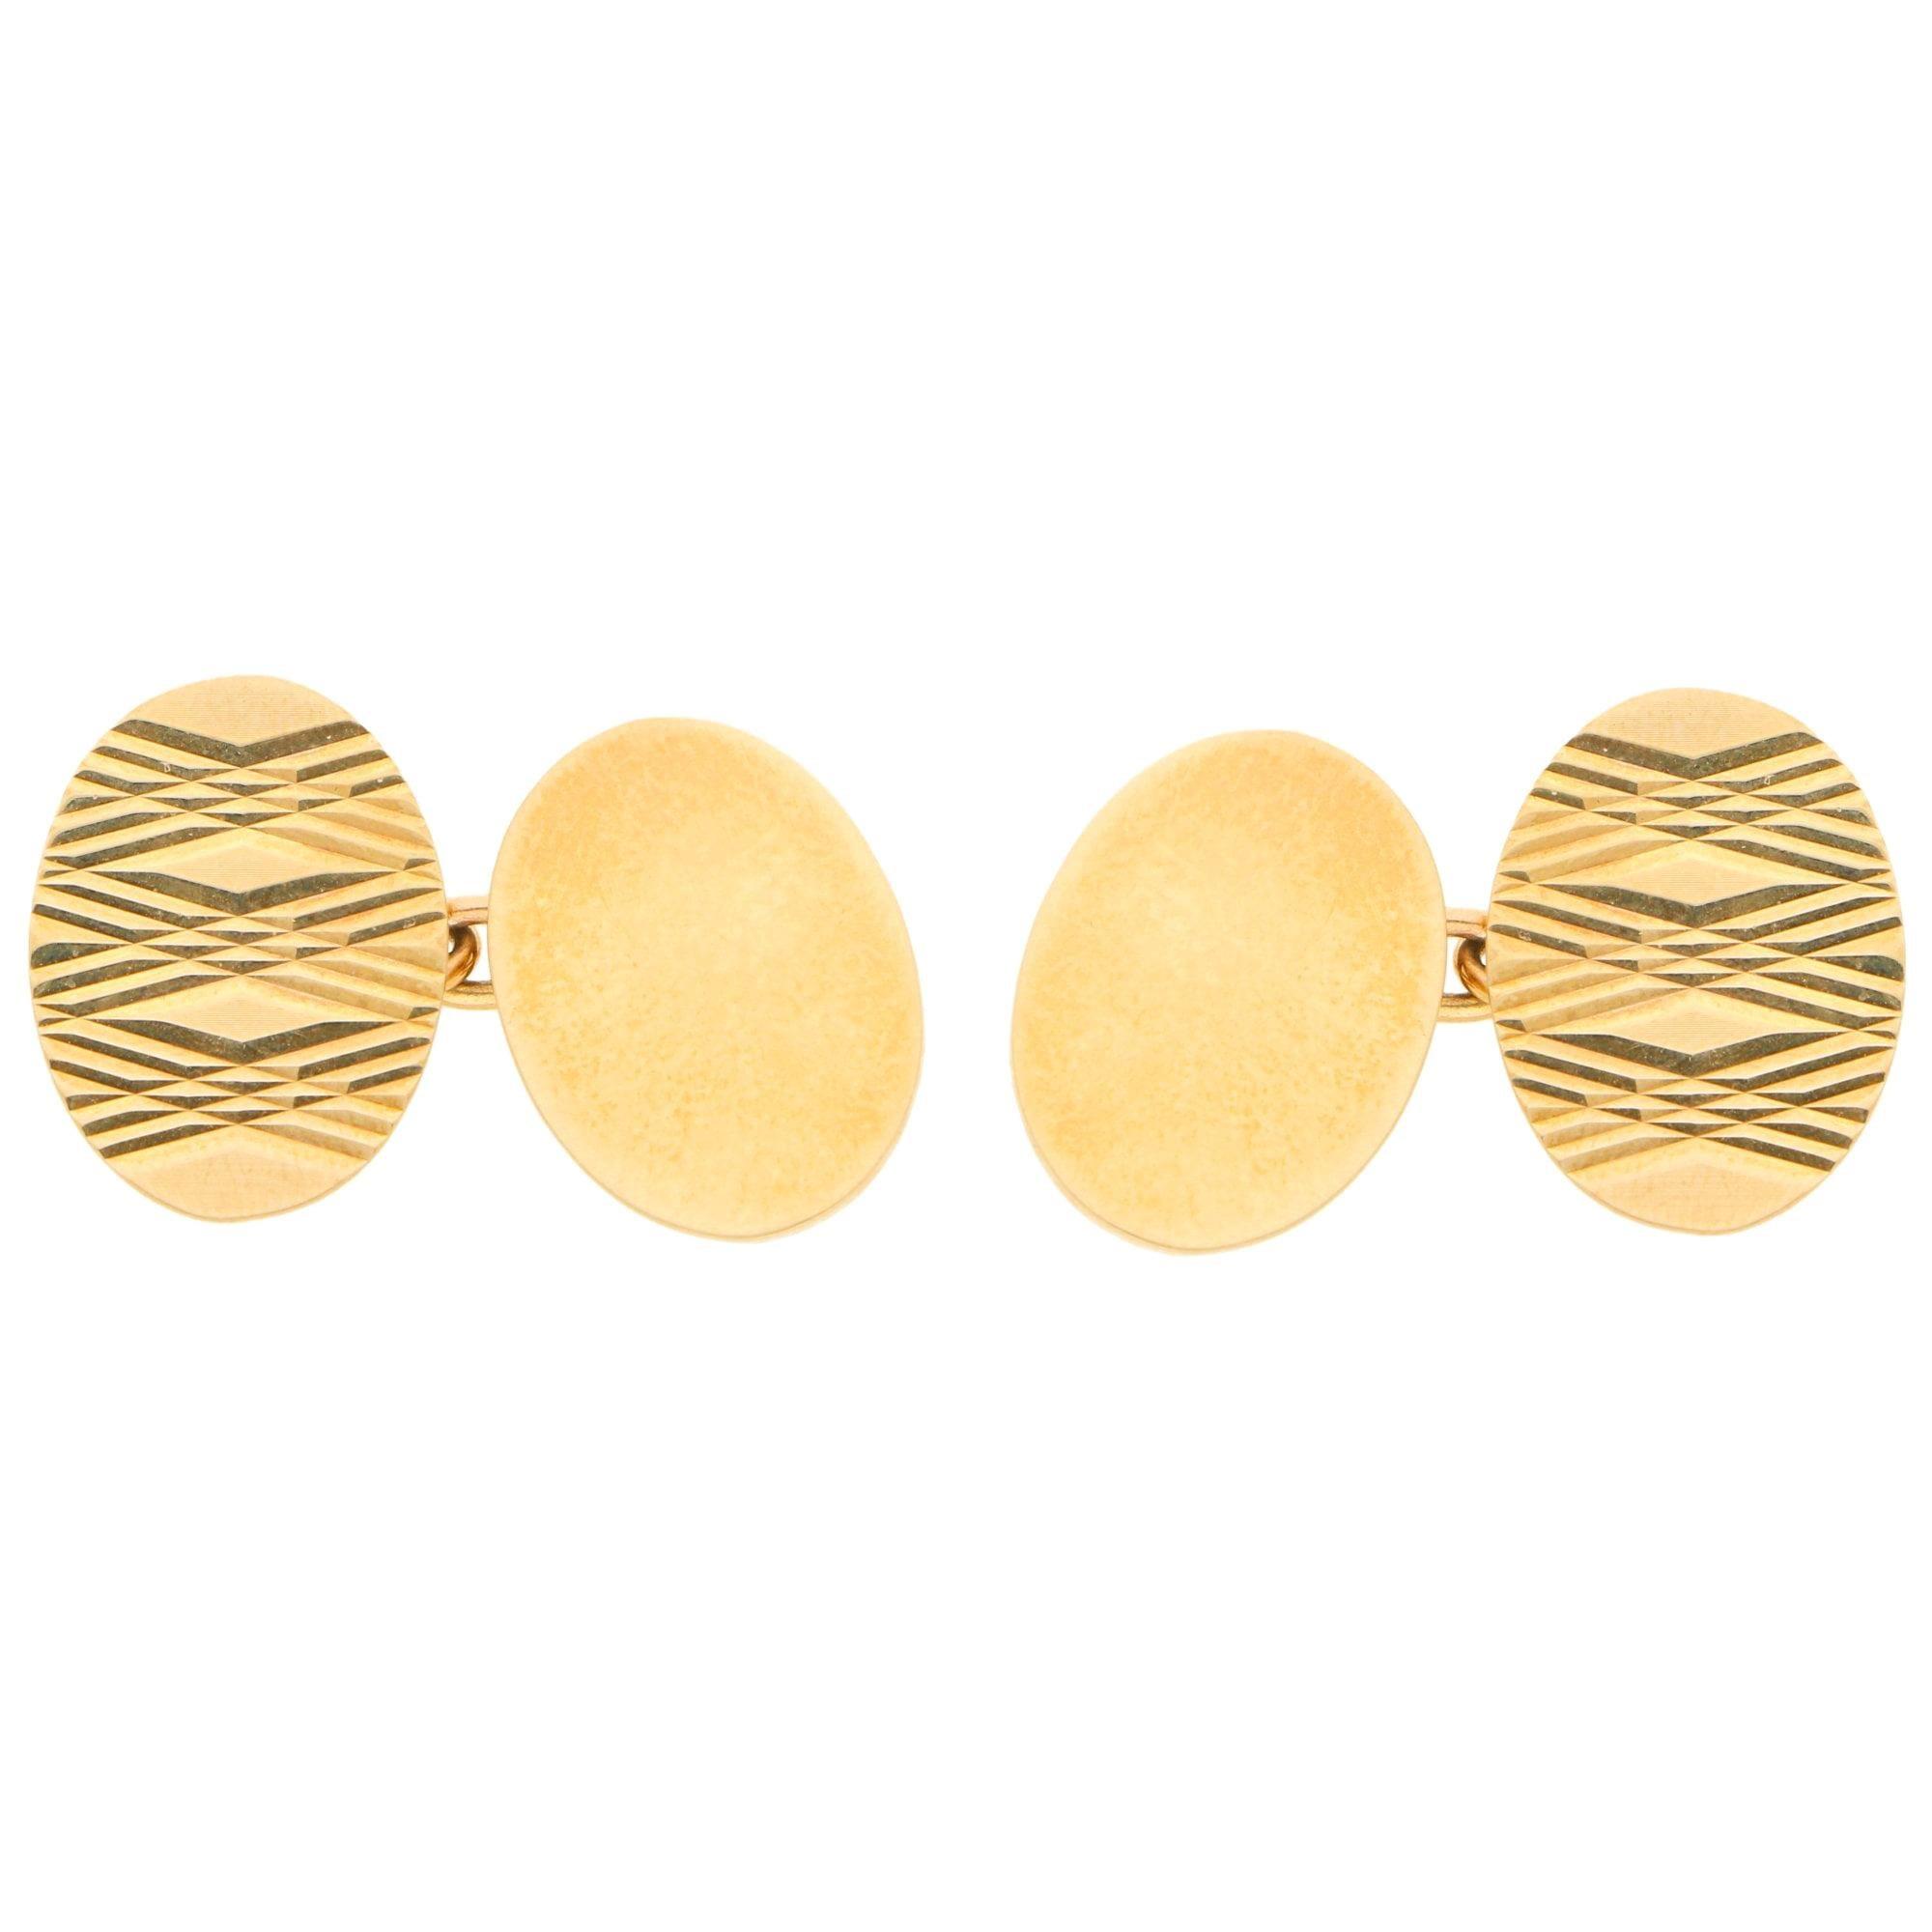 Vintage Oval Geometric Chain Cufflinks Set in 9k Yellow Gold